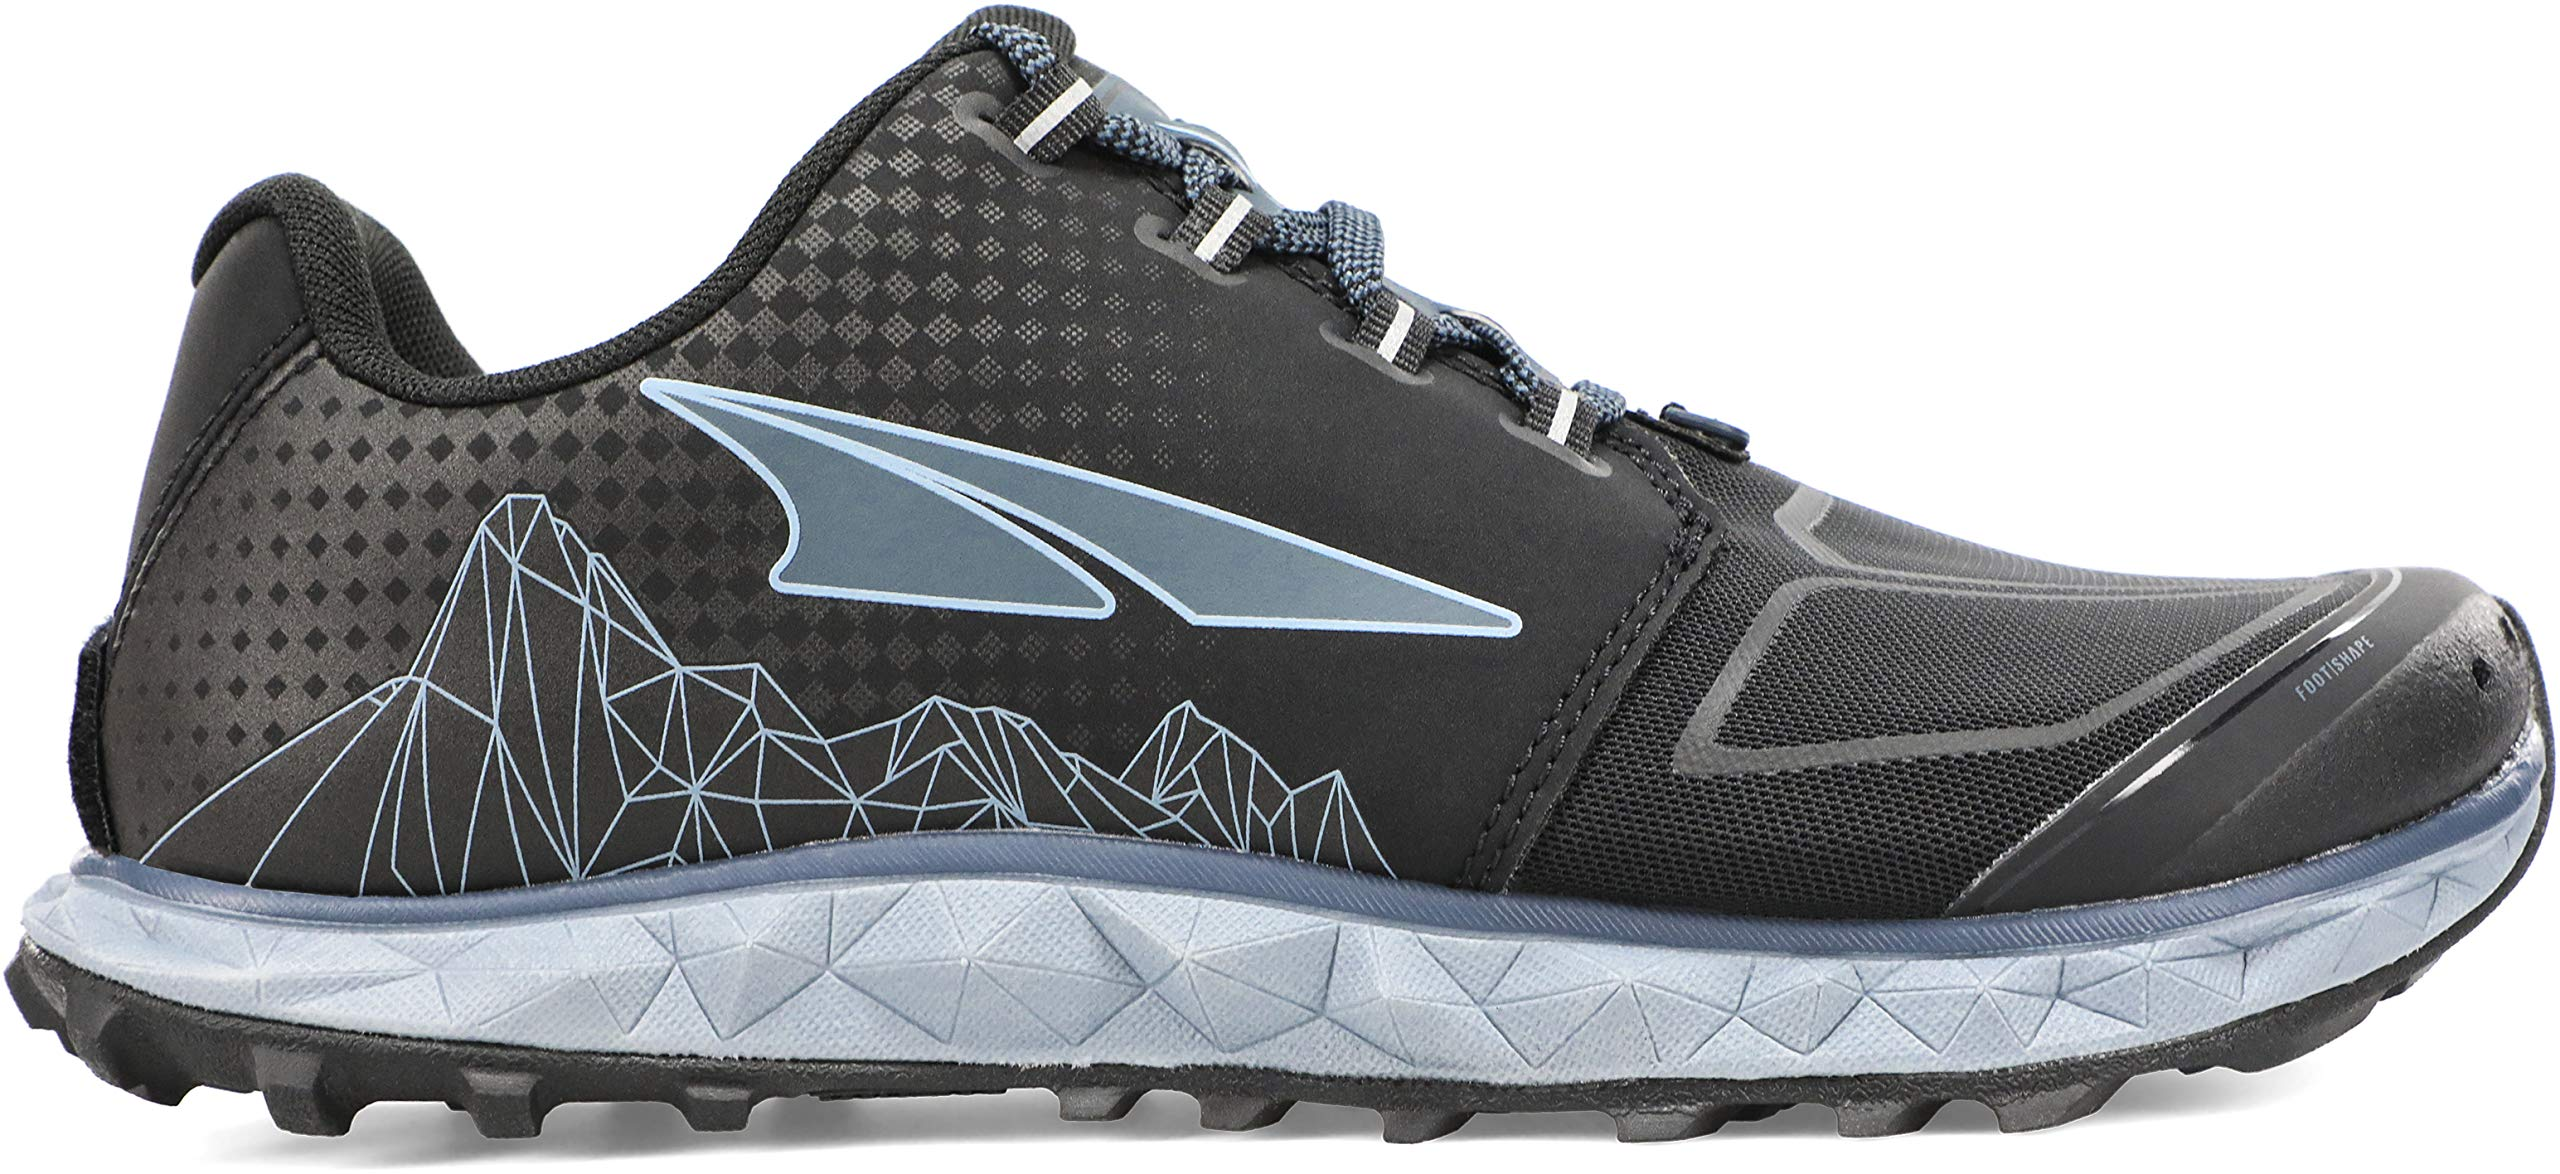 ALTRA Women's AL0A4VR4 Superior 4.5 Trail Running Shoe